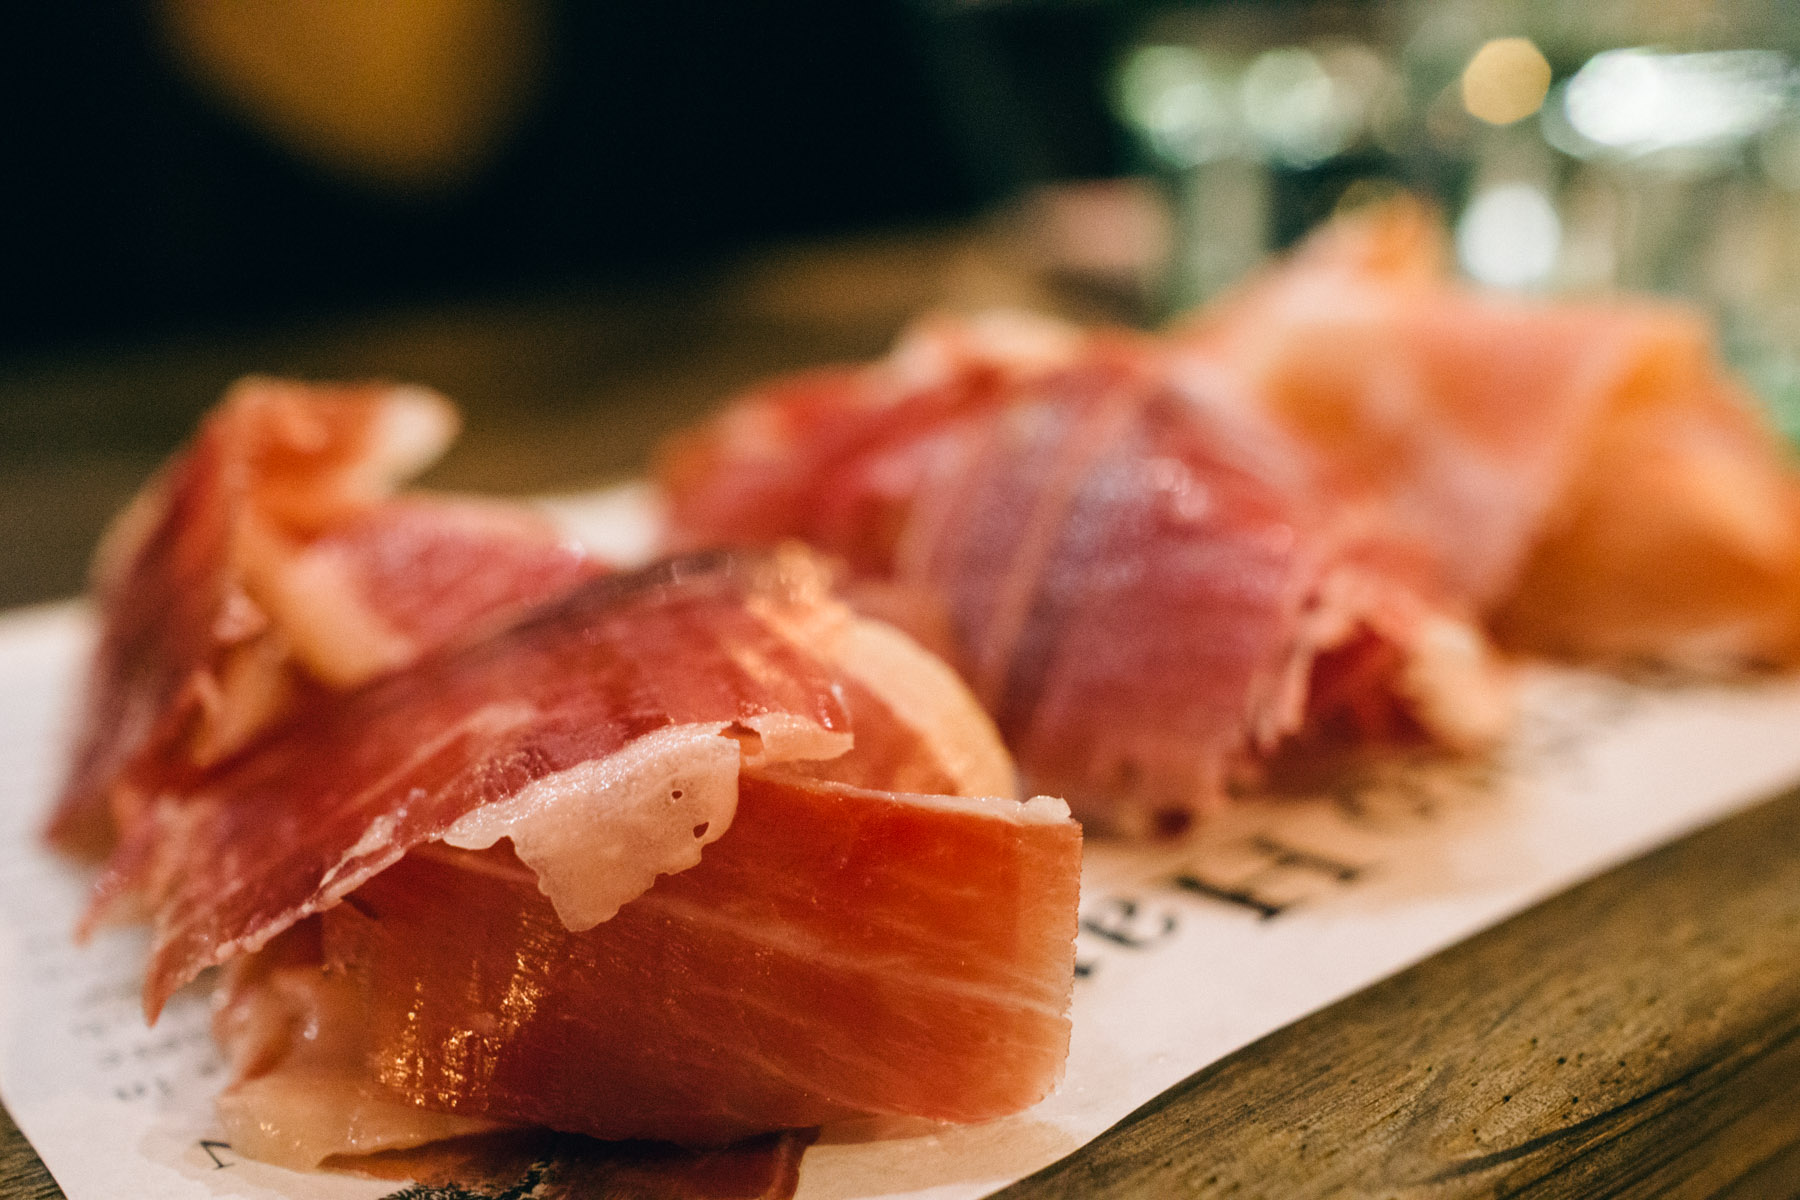 ham-and-sherry-spanish-tapas-ship-street-wan-chai-hong-kong-jason-atherton-10